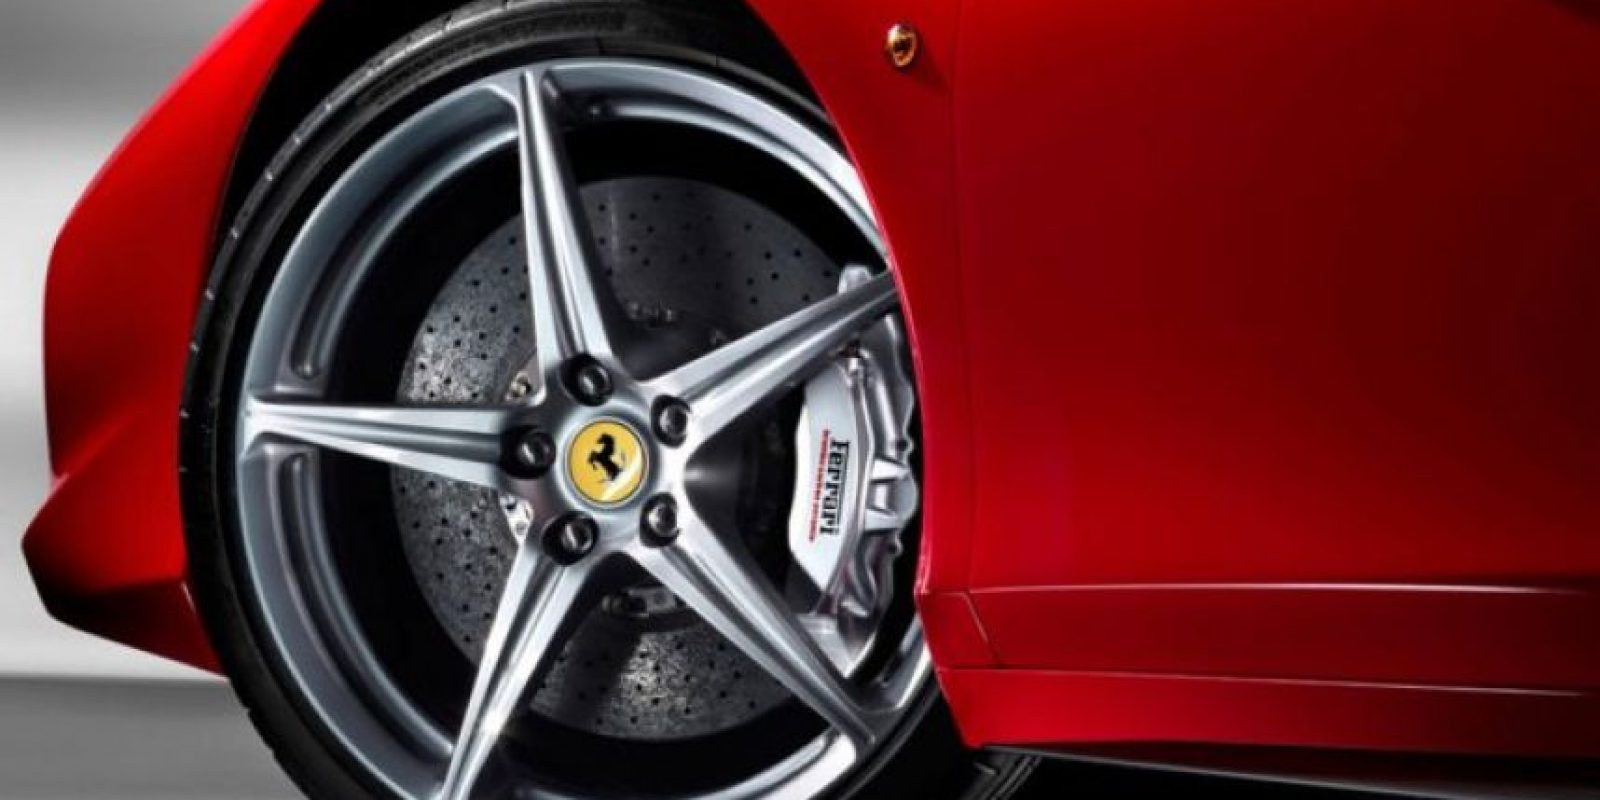 Este lujoso vehículo alcanza velocidades de 325 km/h. Foto:ferrari.com